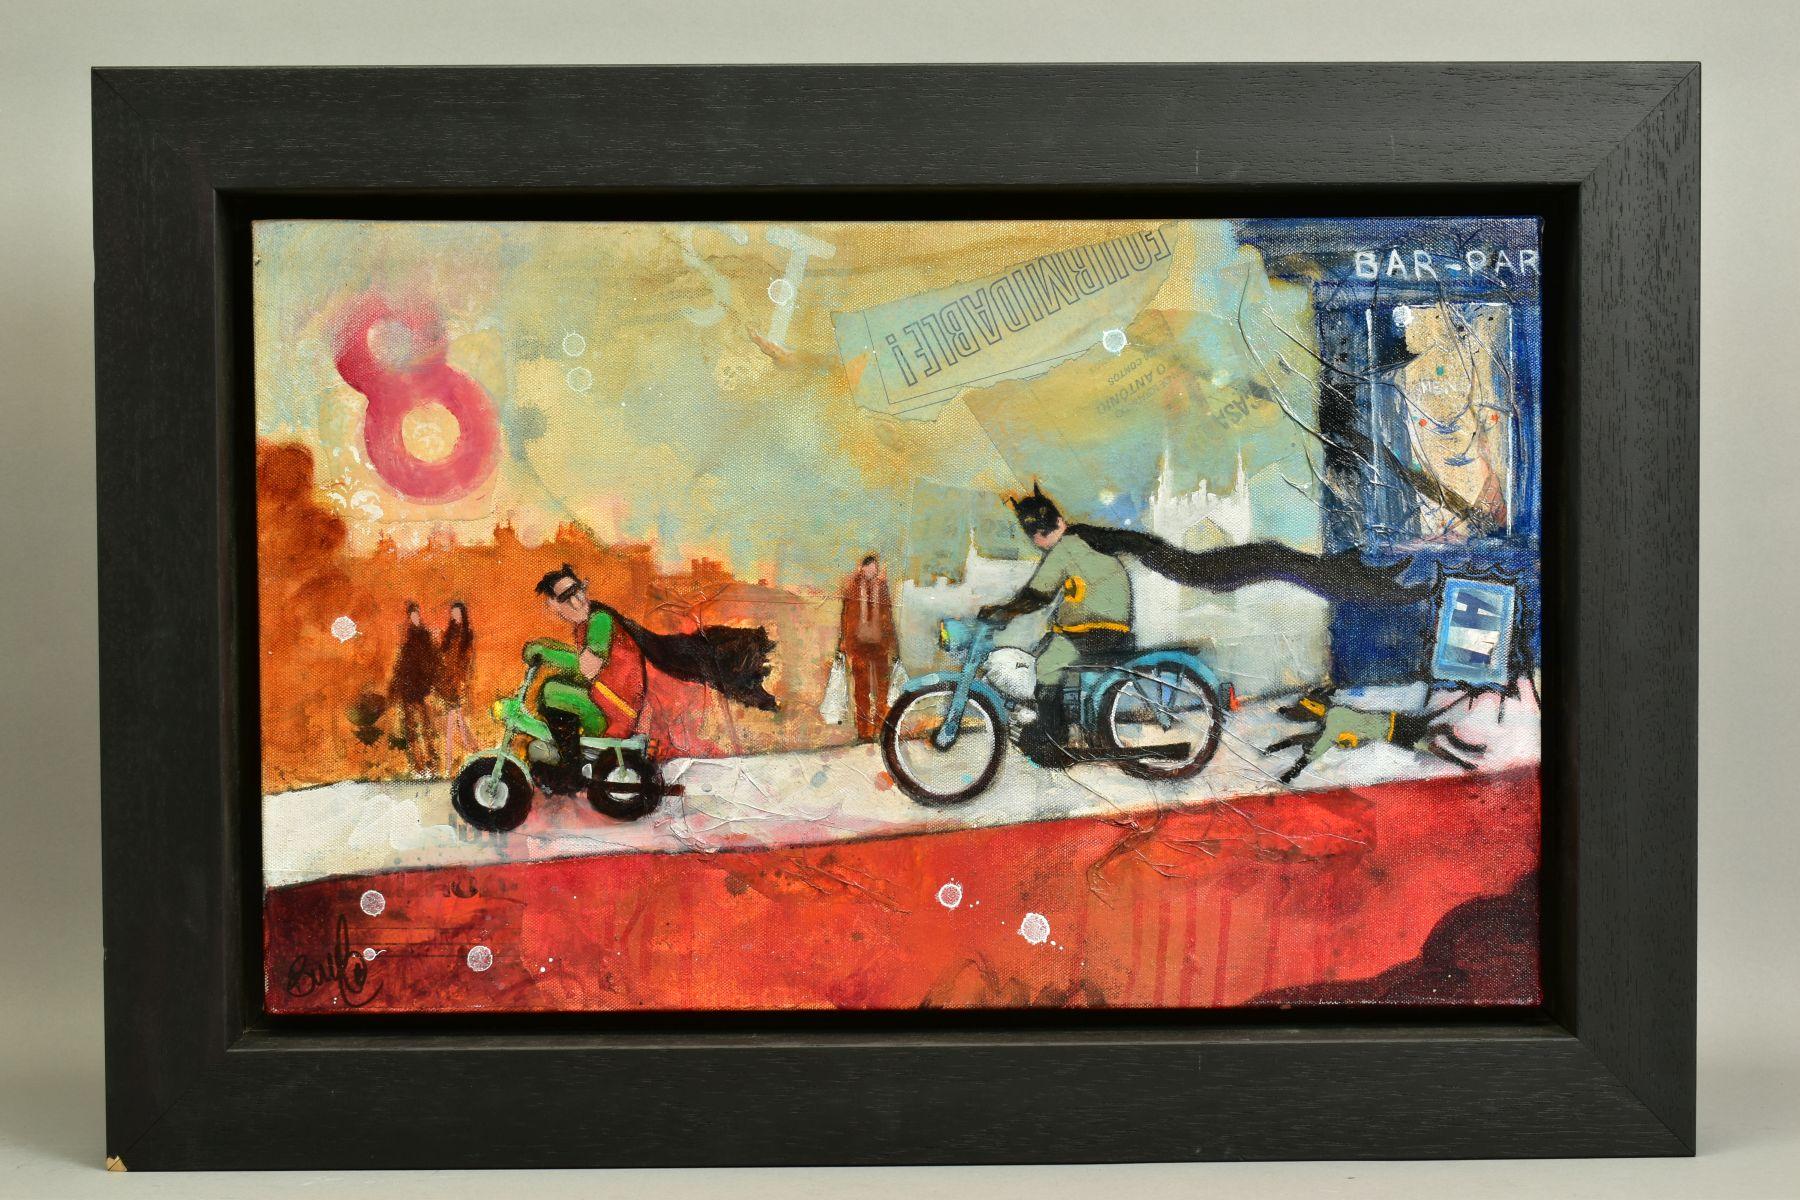 RICHARD BUREL (FRANCE 1974), 'Batman & Robin', the comic super heroes riding mopeds, signed bottom